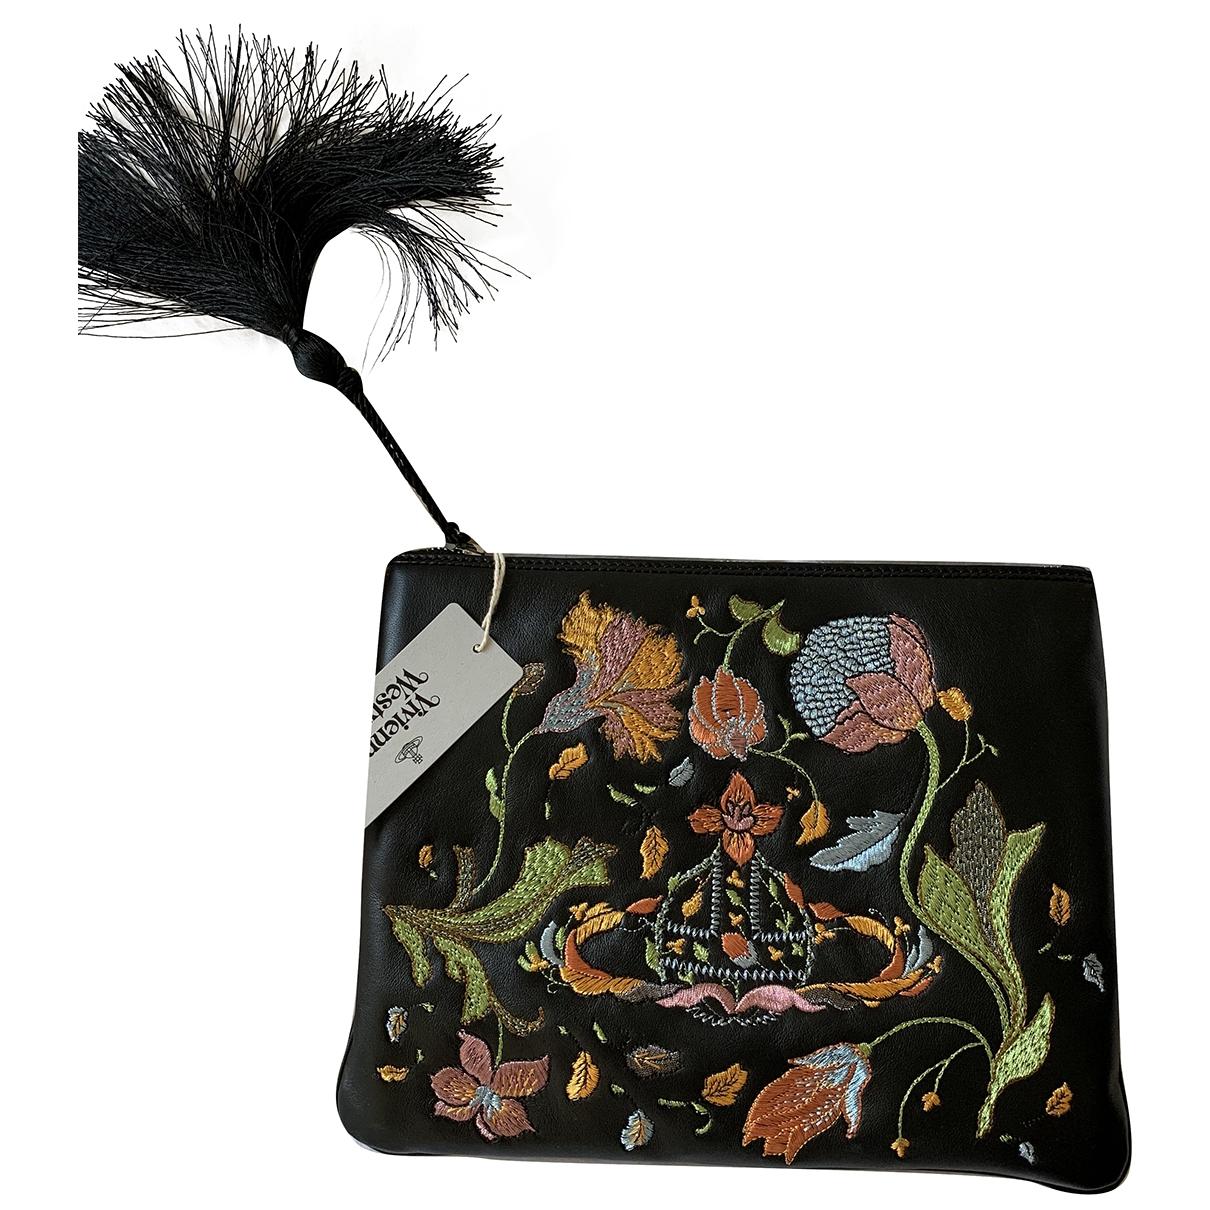 Vivienne Westwood \N Black Leather Clutch bag for Women \N